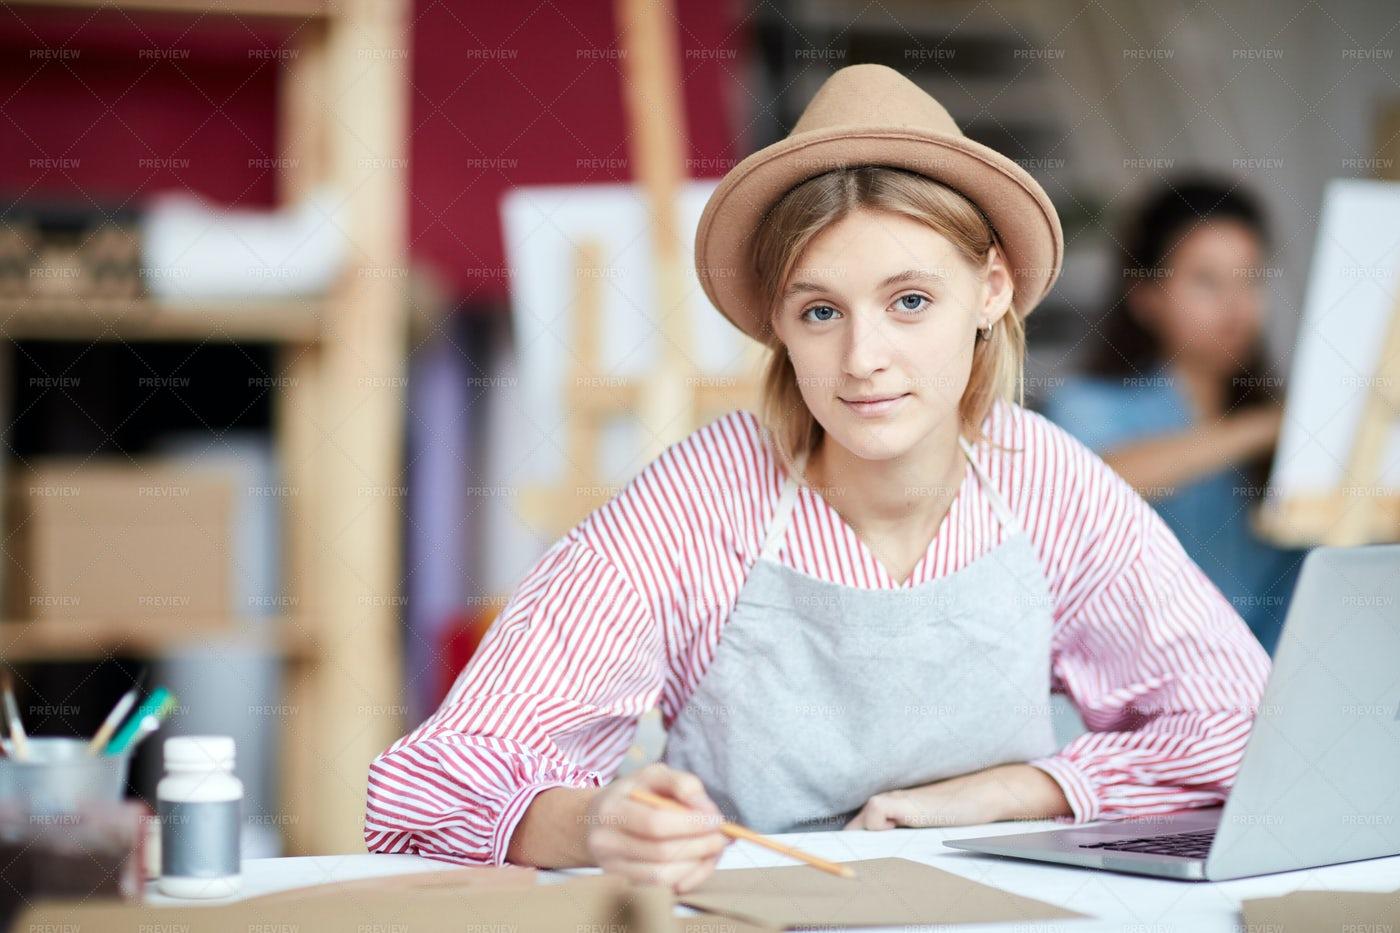 Girl Making Sketch: Stock Photos